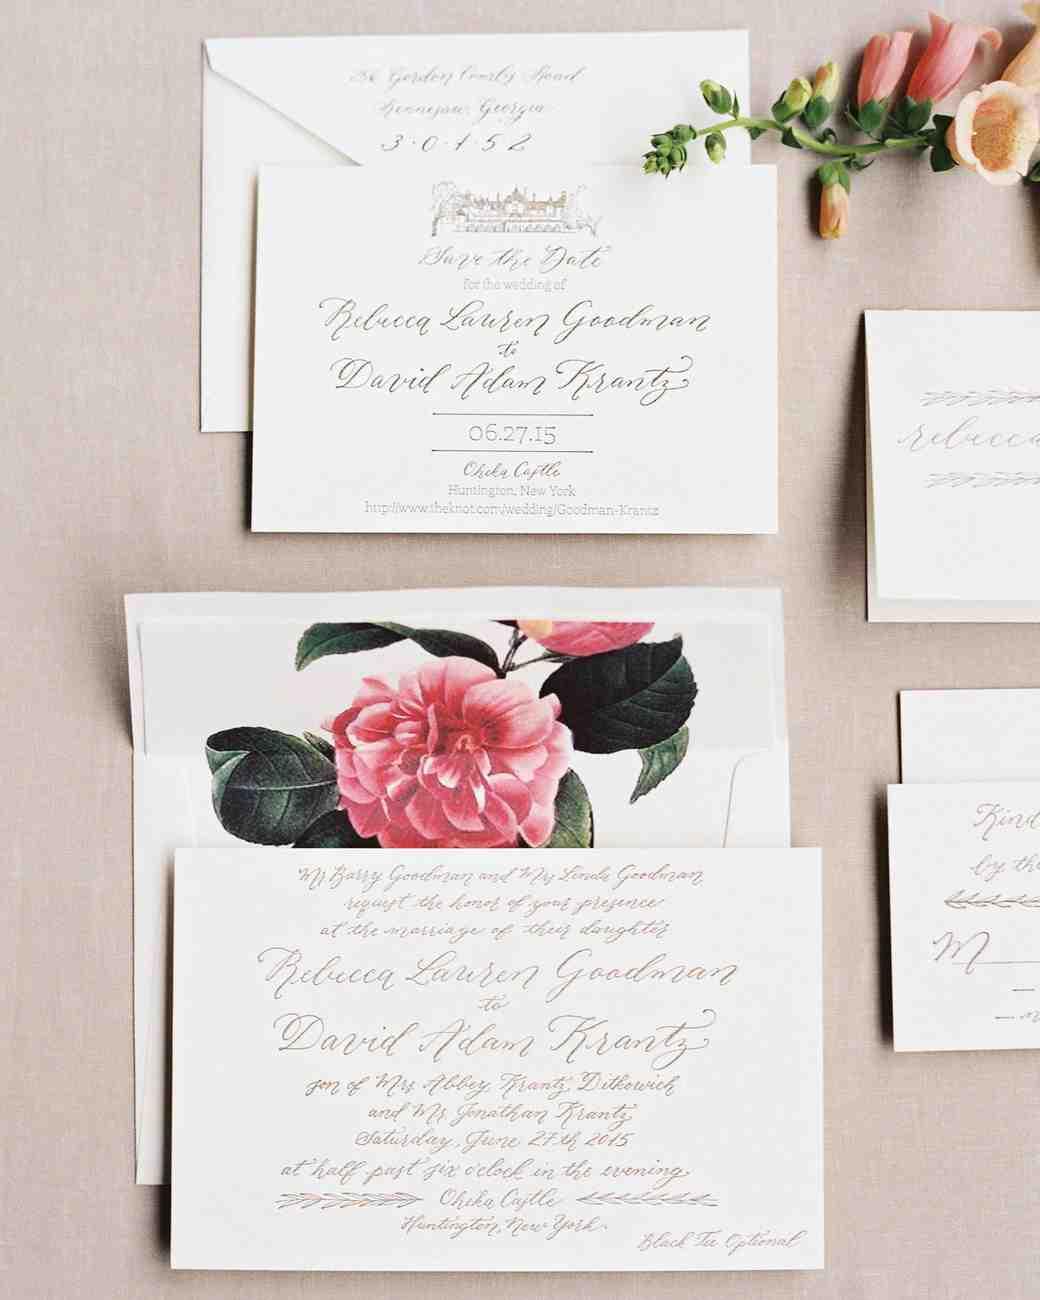 best spring wedding invitations wedding invitation suites Elegant Spring Invitations with Camellia Flower Envelope Liners